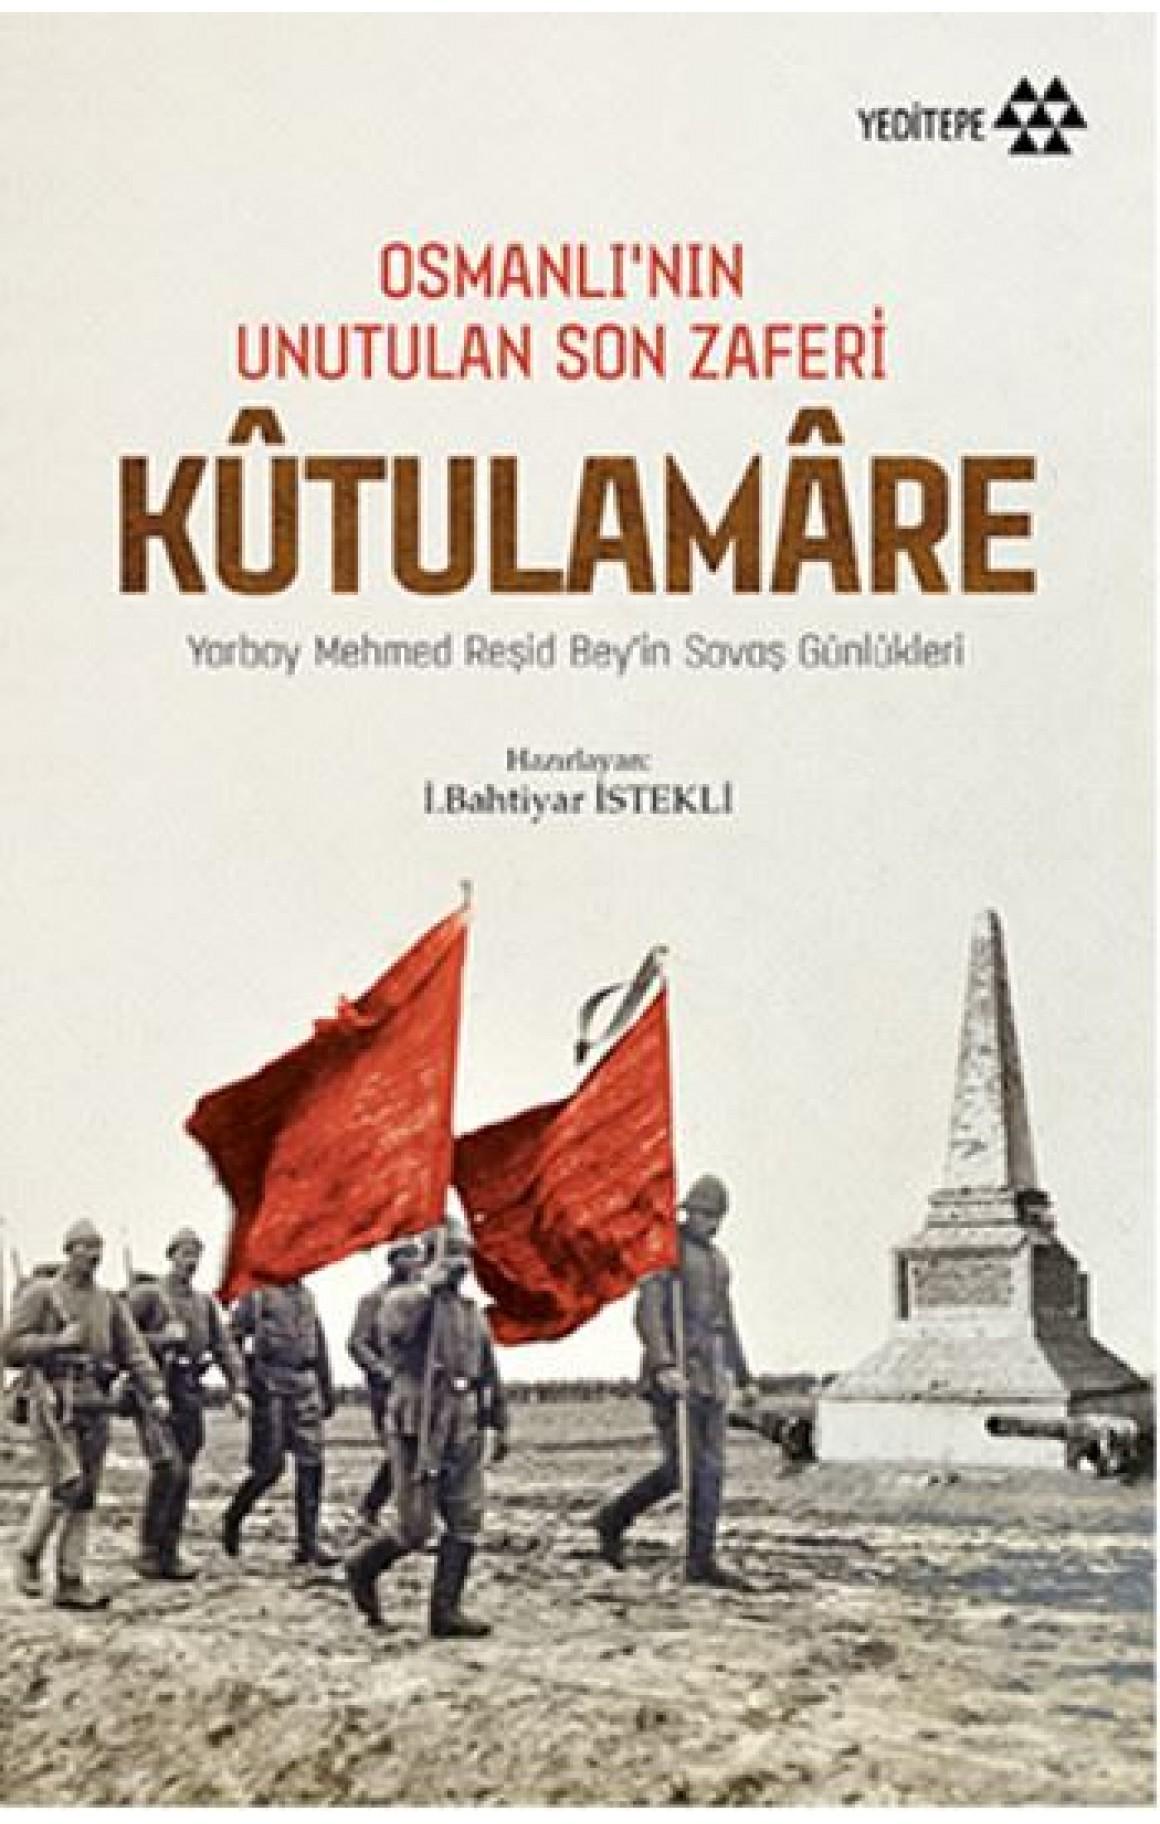 Osmanlının Unutulan Son Zaferi Kutulamare